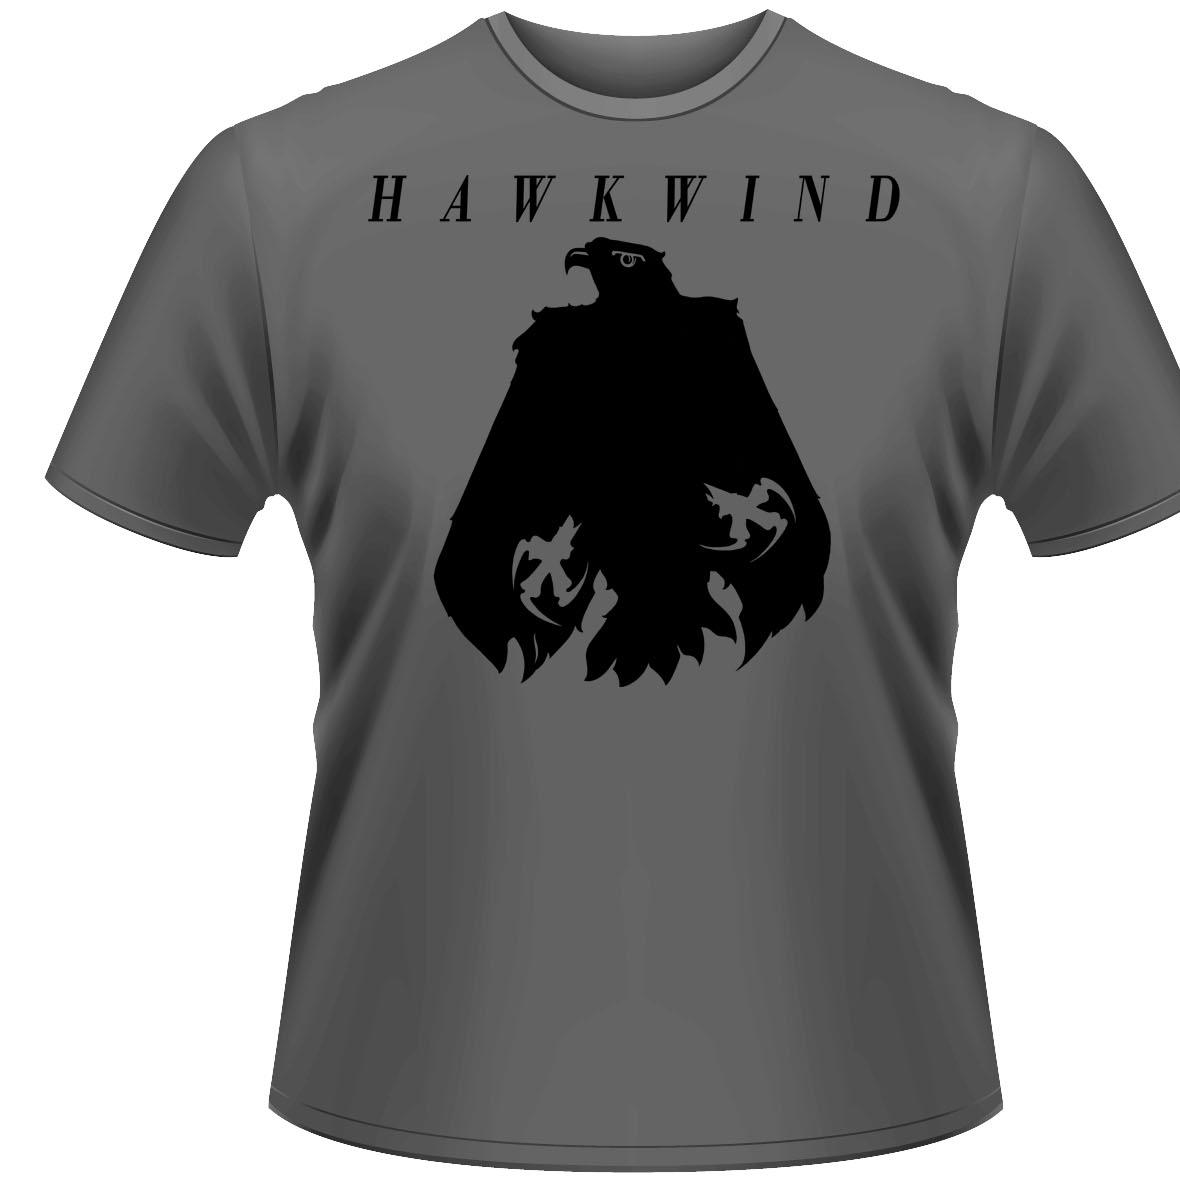 HAWKWIND - EAGLE (T-SHIRT UNISEX TG. M)